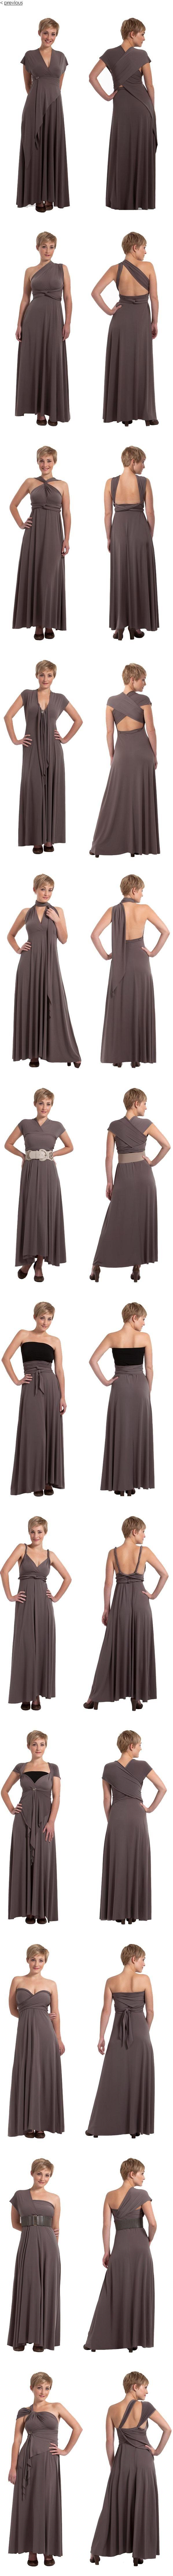 RICCI - Sass Designs - so many ways to wear it.